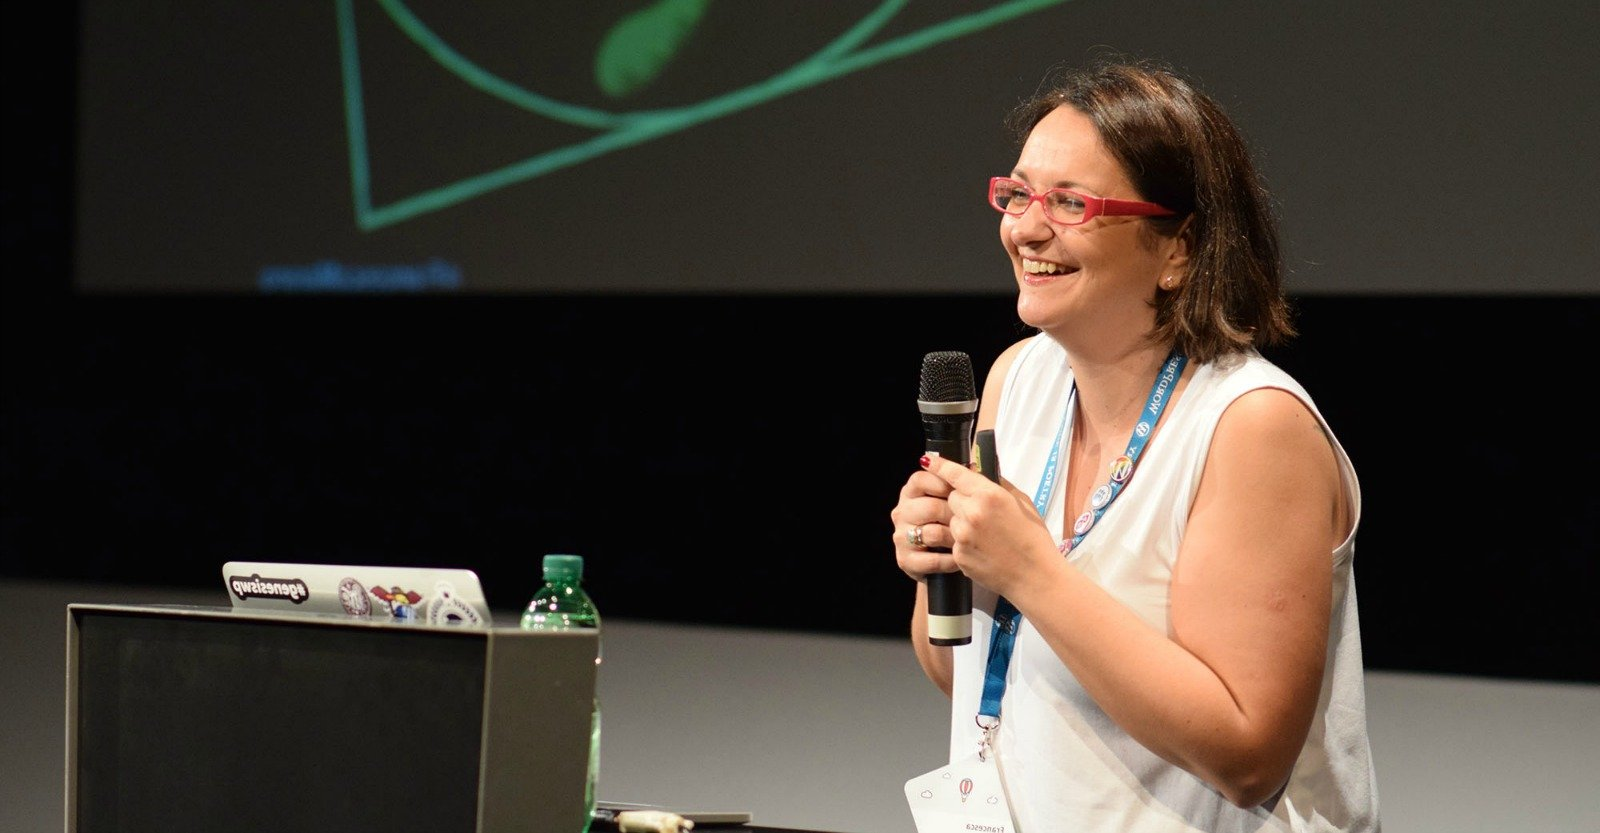 Francesca Marano sul palco di WordCamp Europe 2016 - foto di Jonas Andrijauskas